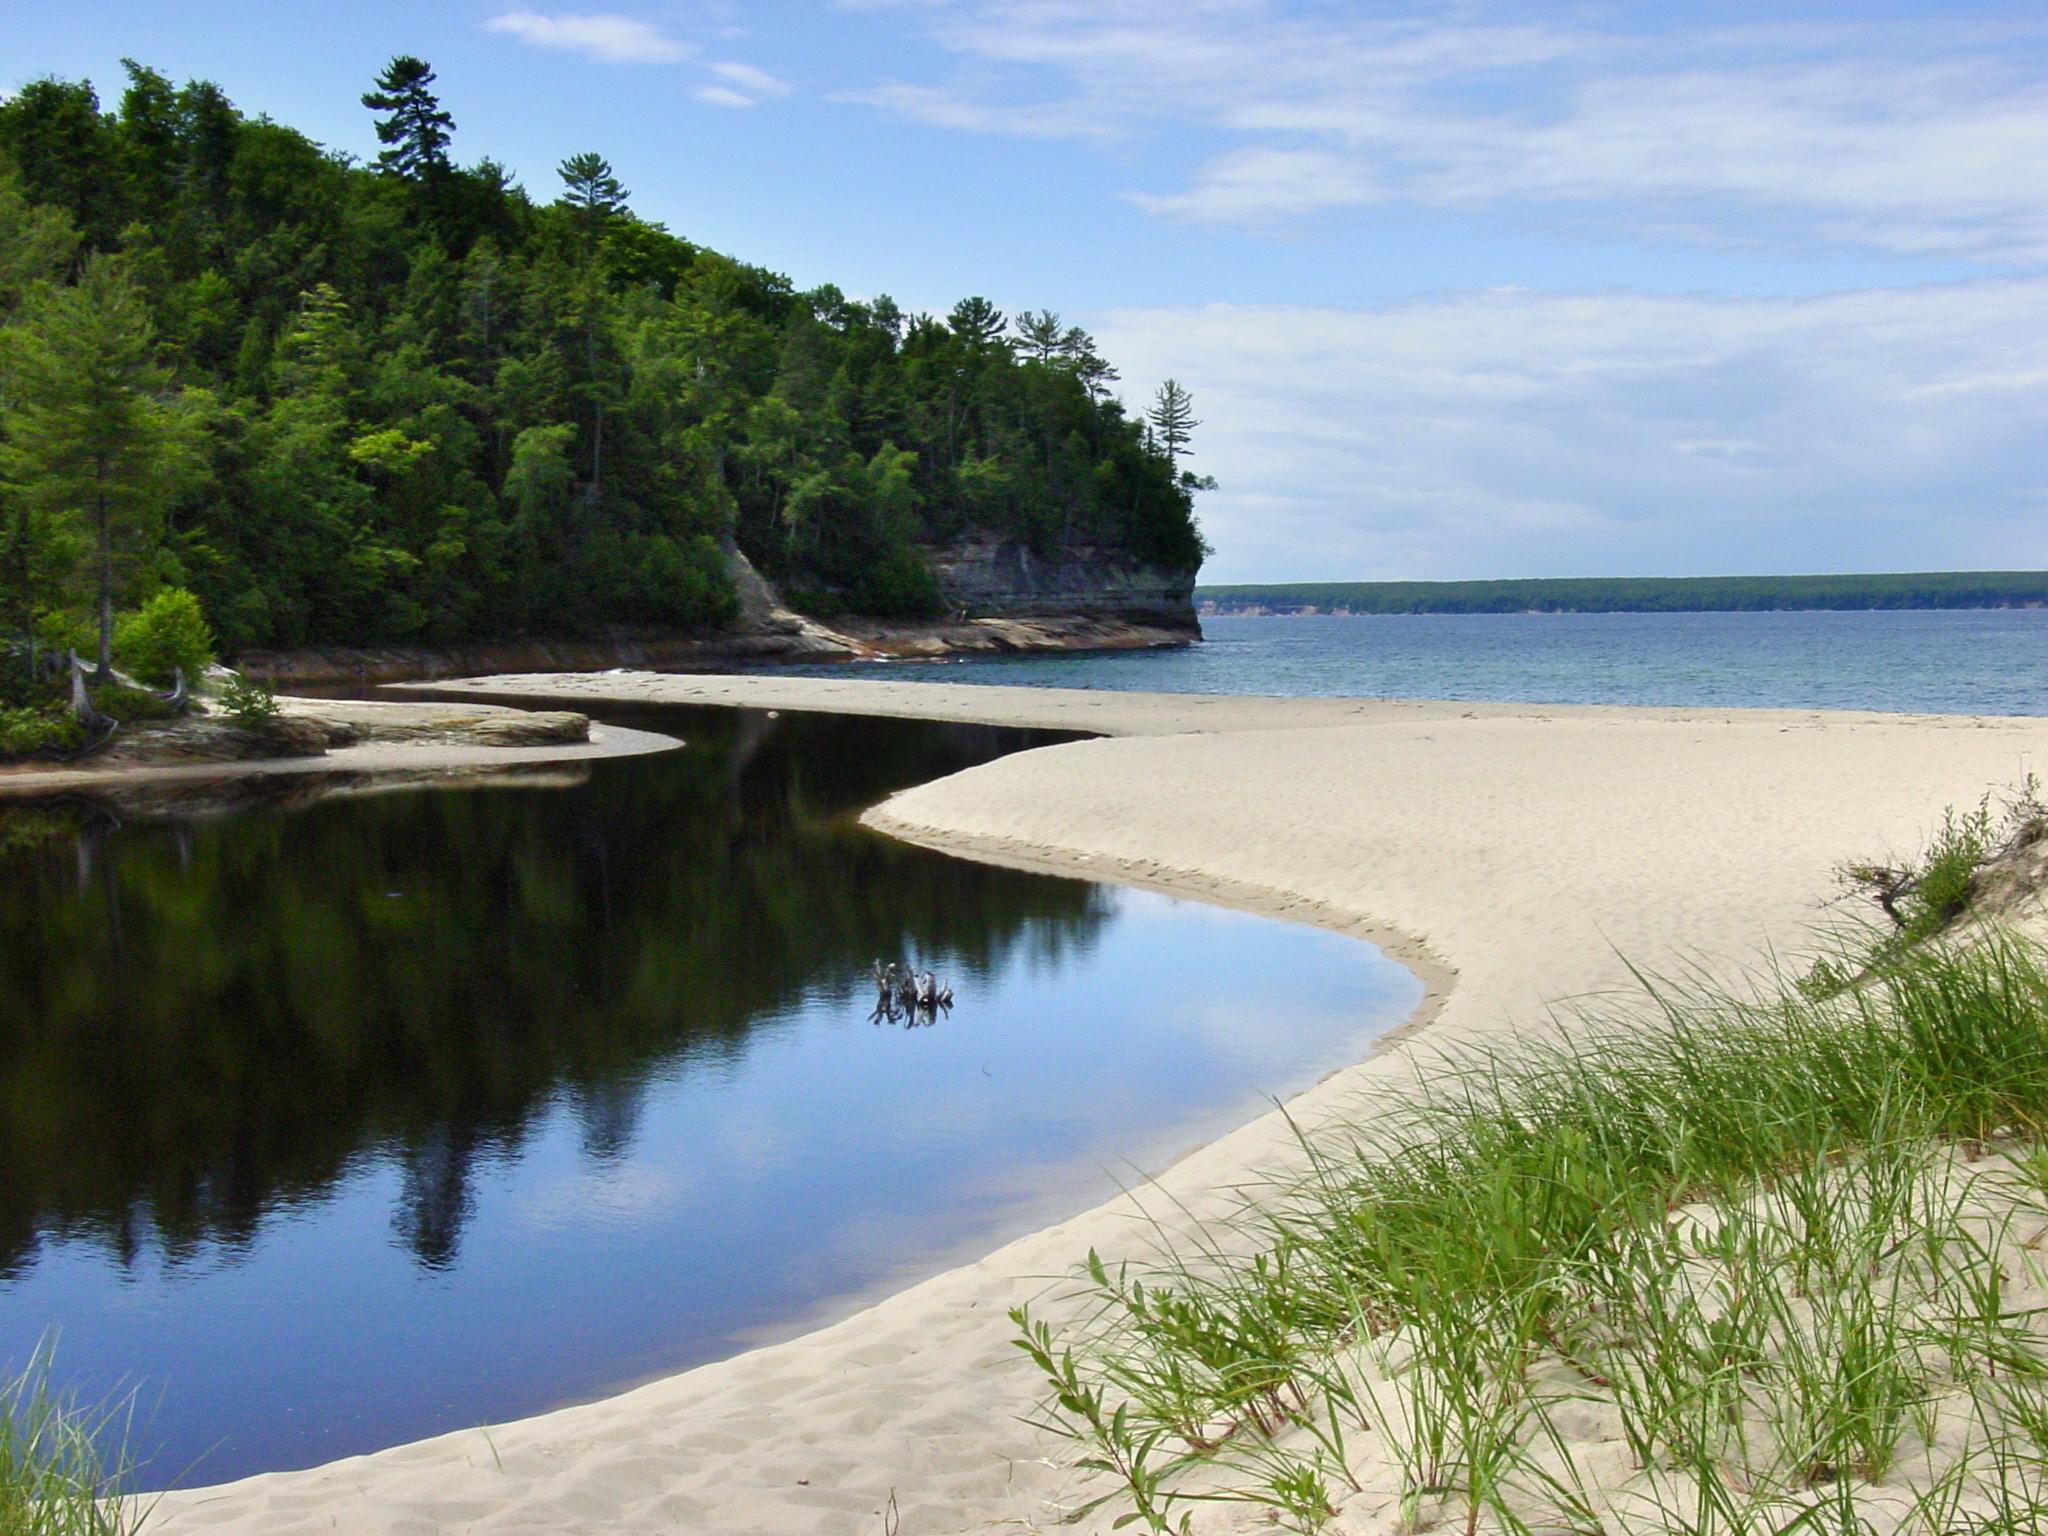 Pictured Rocks National Lakeshore, Lake Superior. Image credit: Michigan Sea Grant